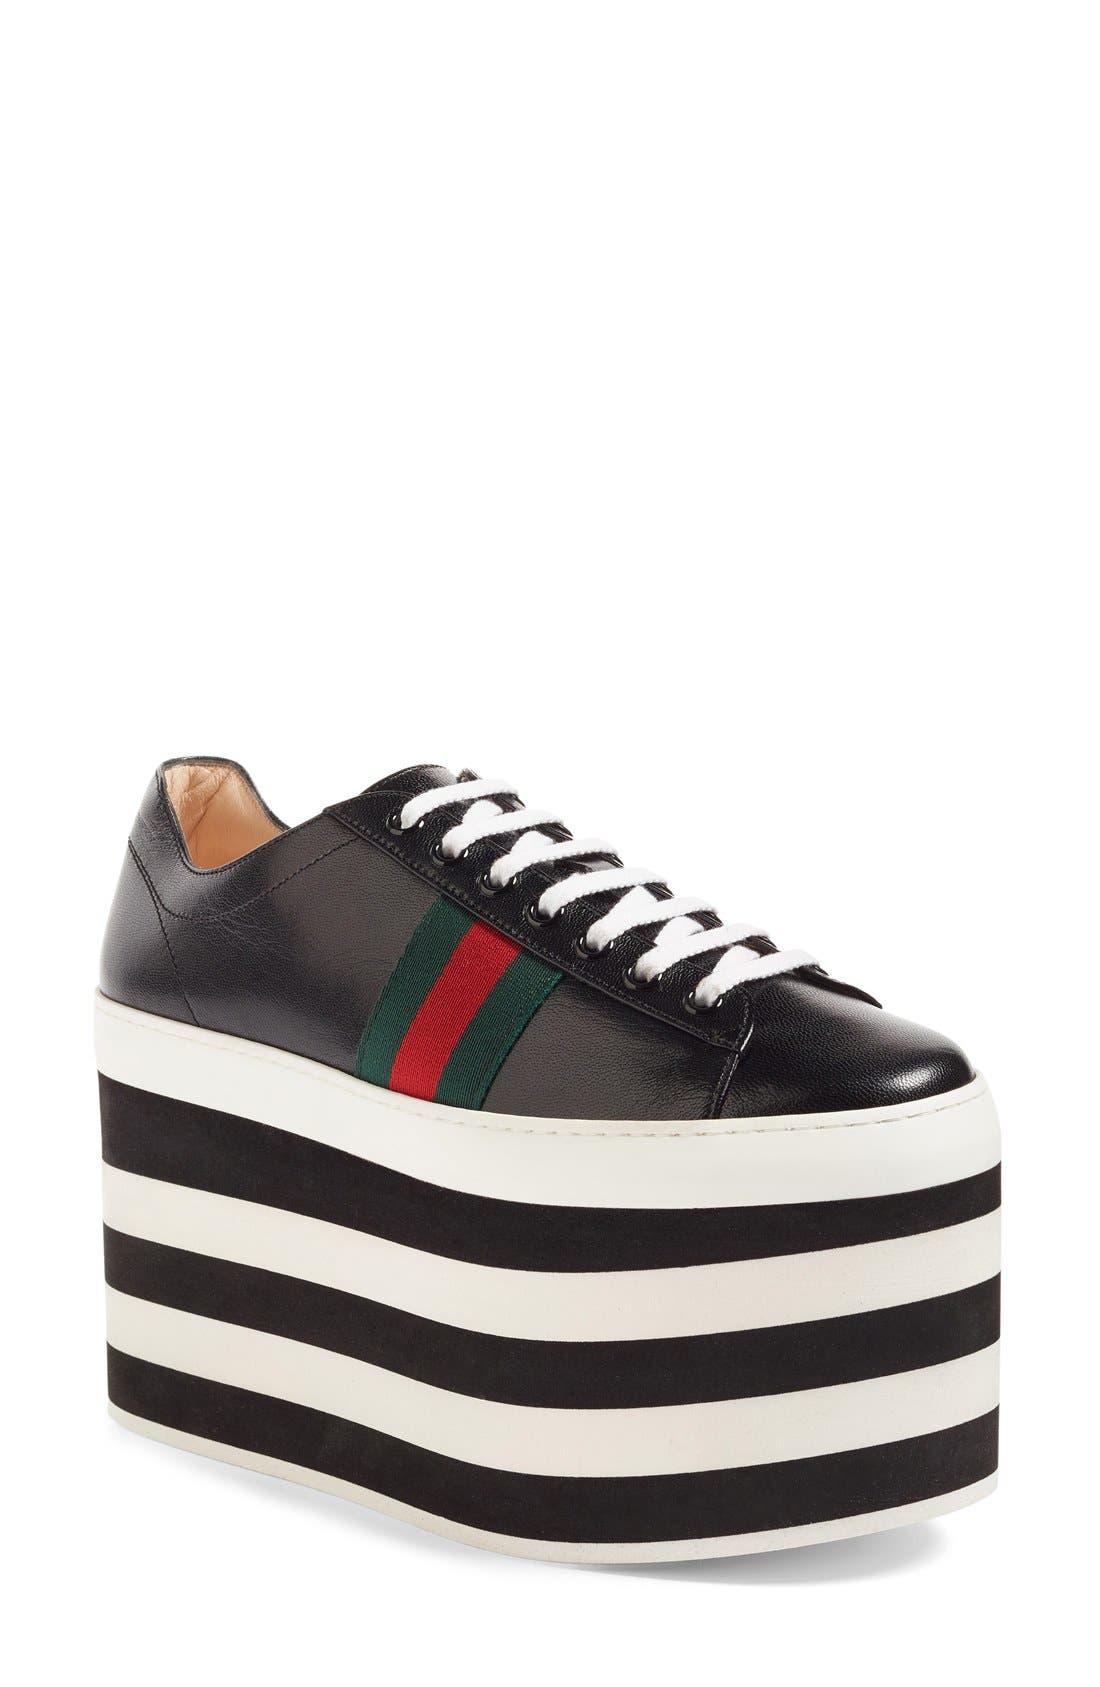 Main Image - Gucci Peggy Platform Sneaker (Women)